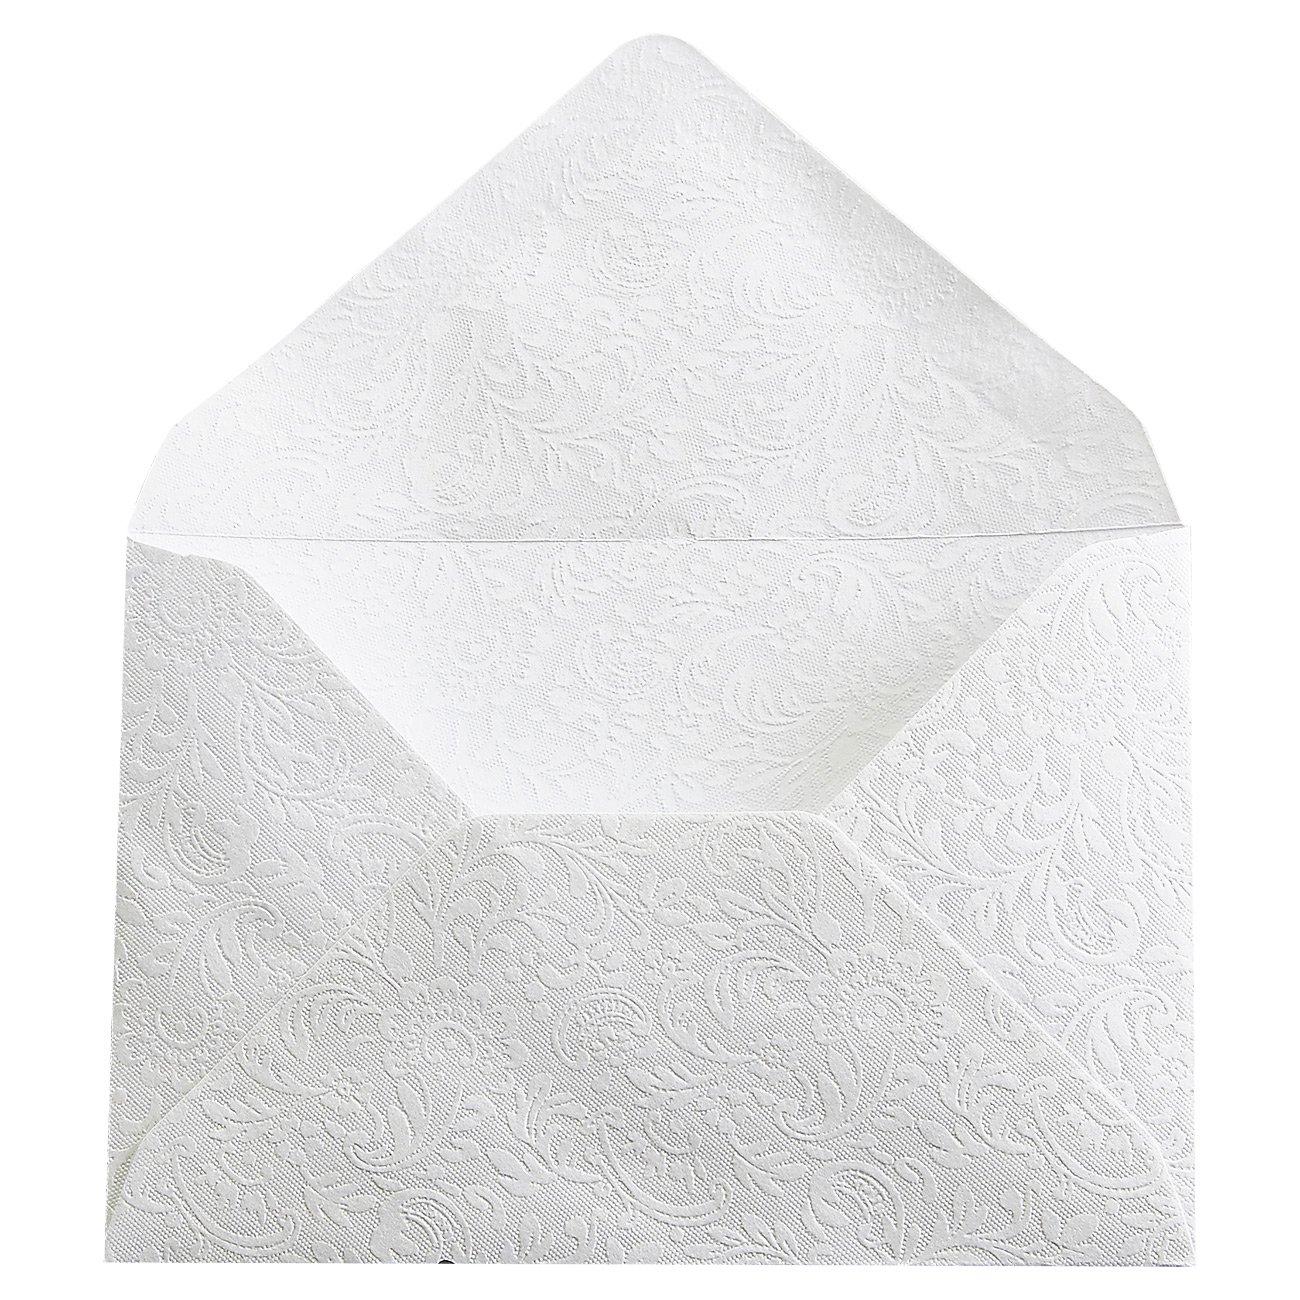 Mini Envelopes - 100-Count Bulk Gift Card Envelopes, Floral Pattern Business Card Envelopes, Bulk Tiny Envelope Pockets for Small Note Cards, White 4 x 2.7 Inches